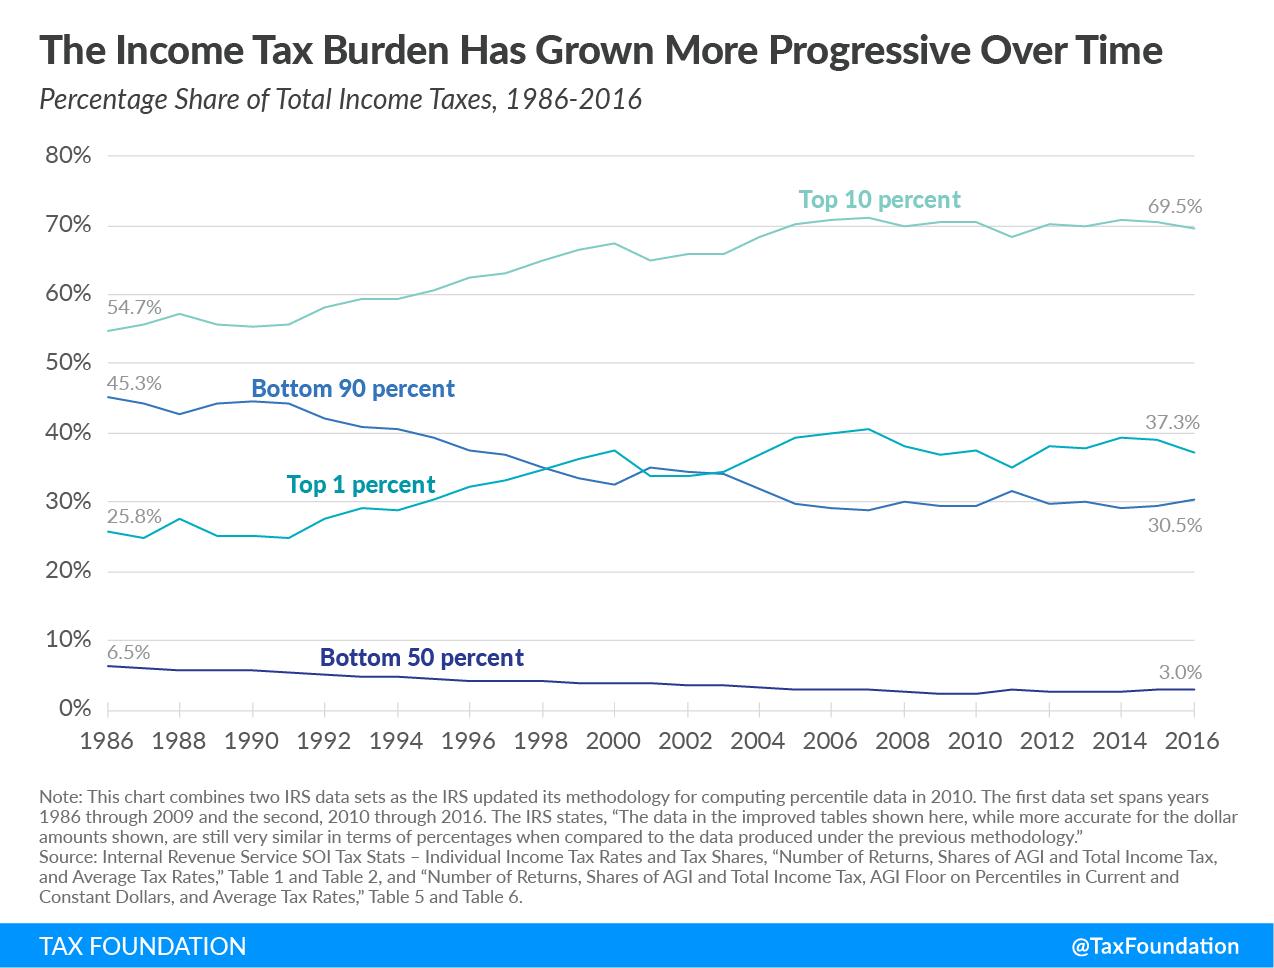 Income tax burden has grown more progressive over time